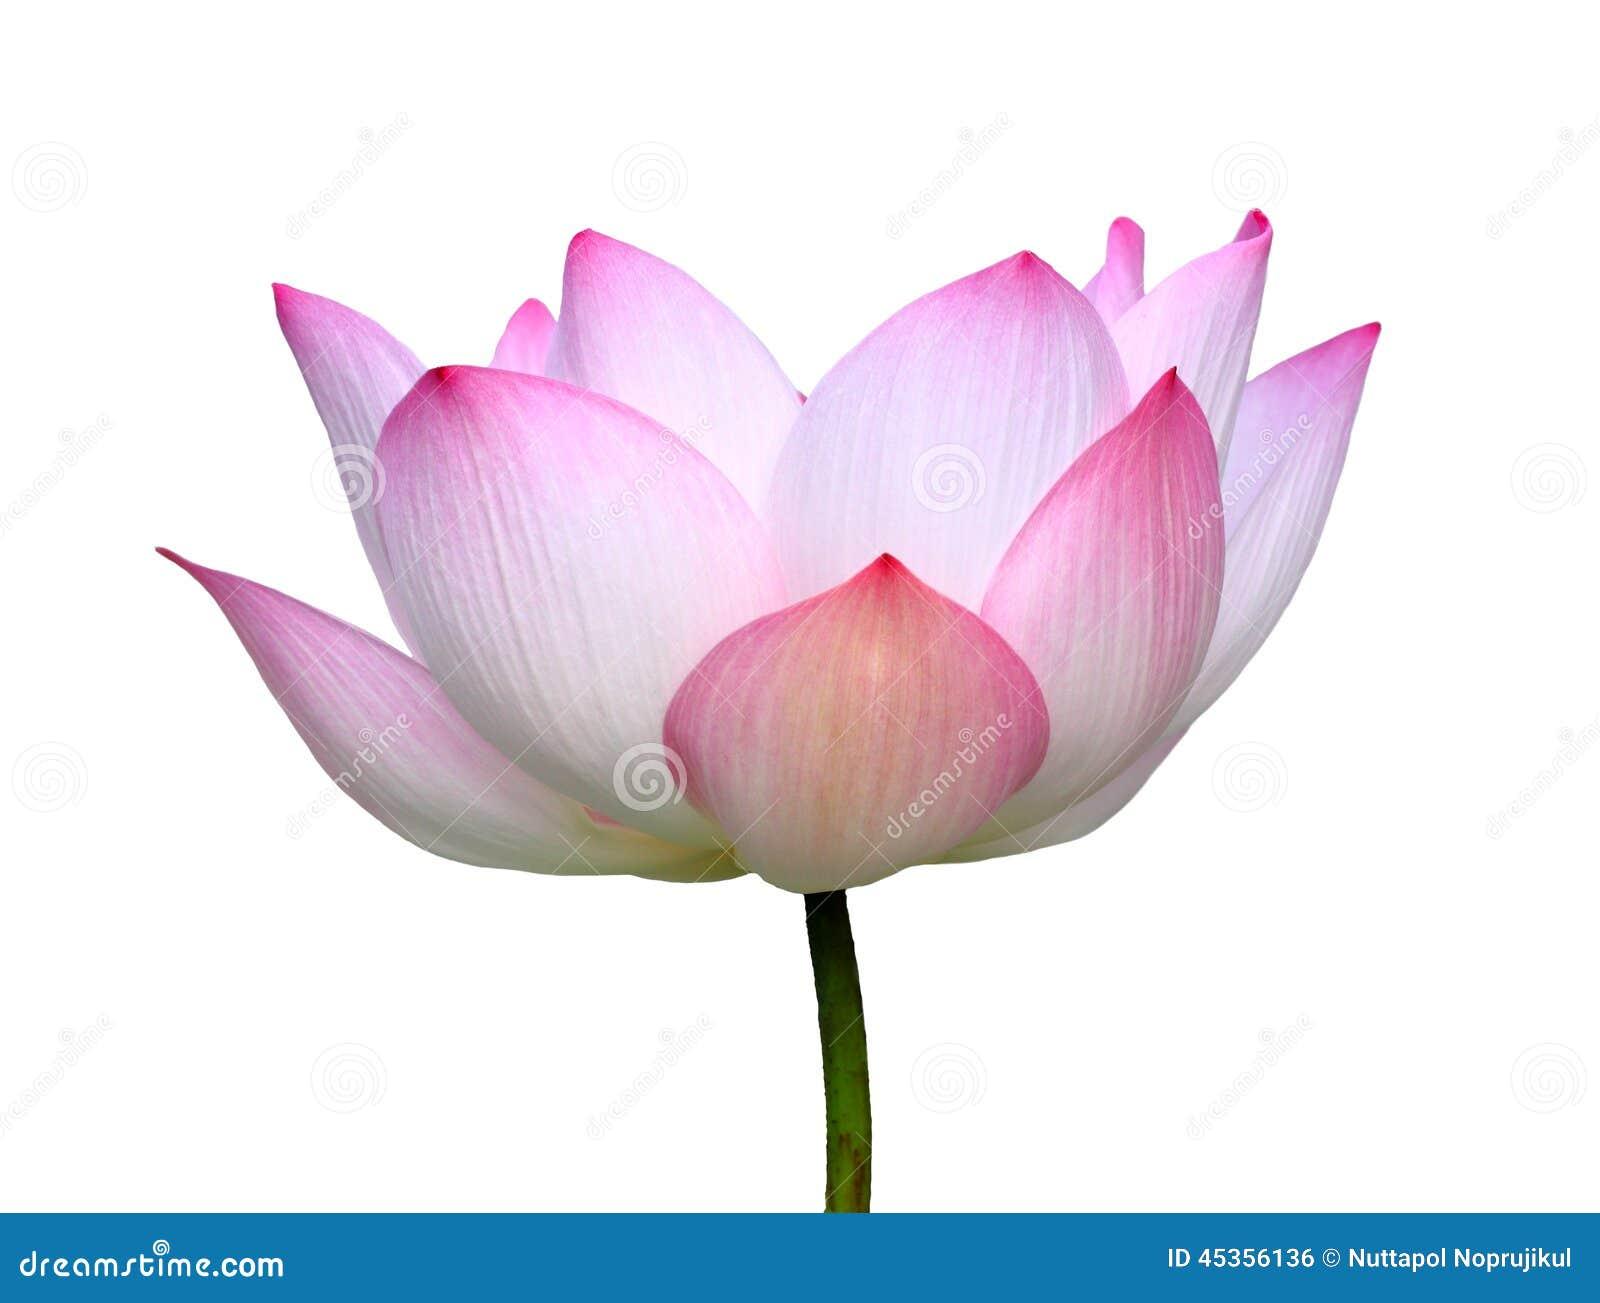 Beautiful Lotussingle Lotus Flower Isolated On White Background